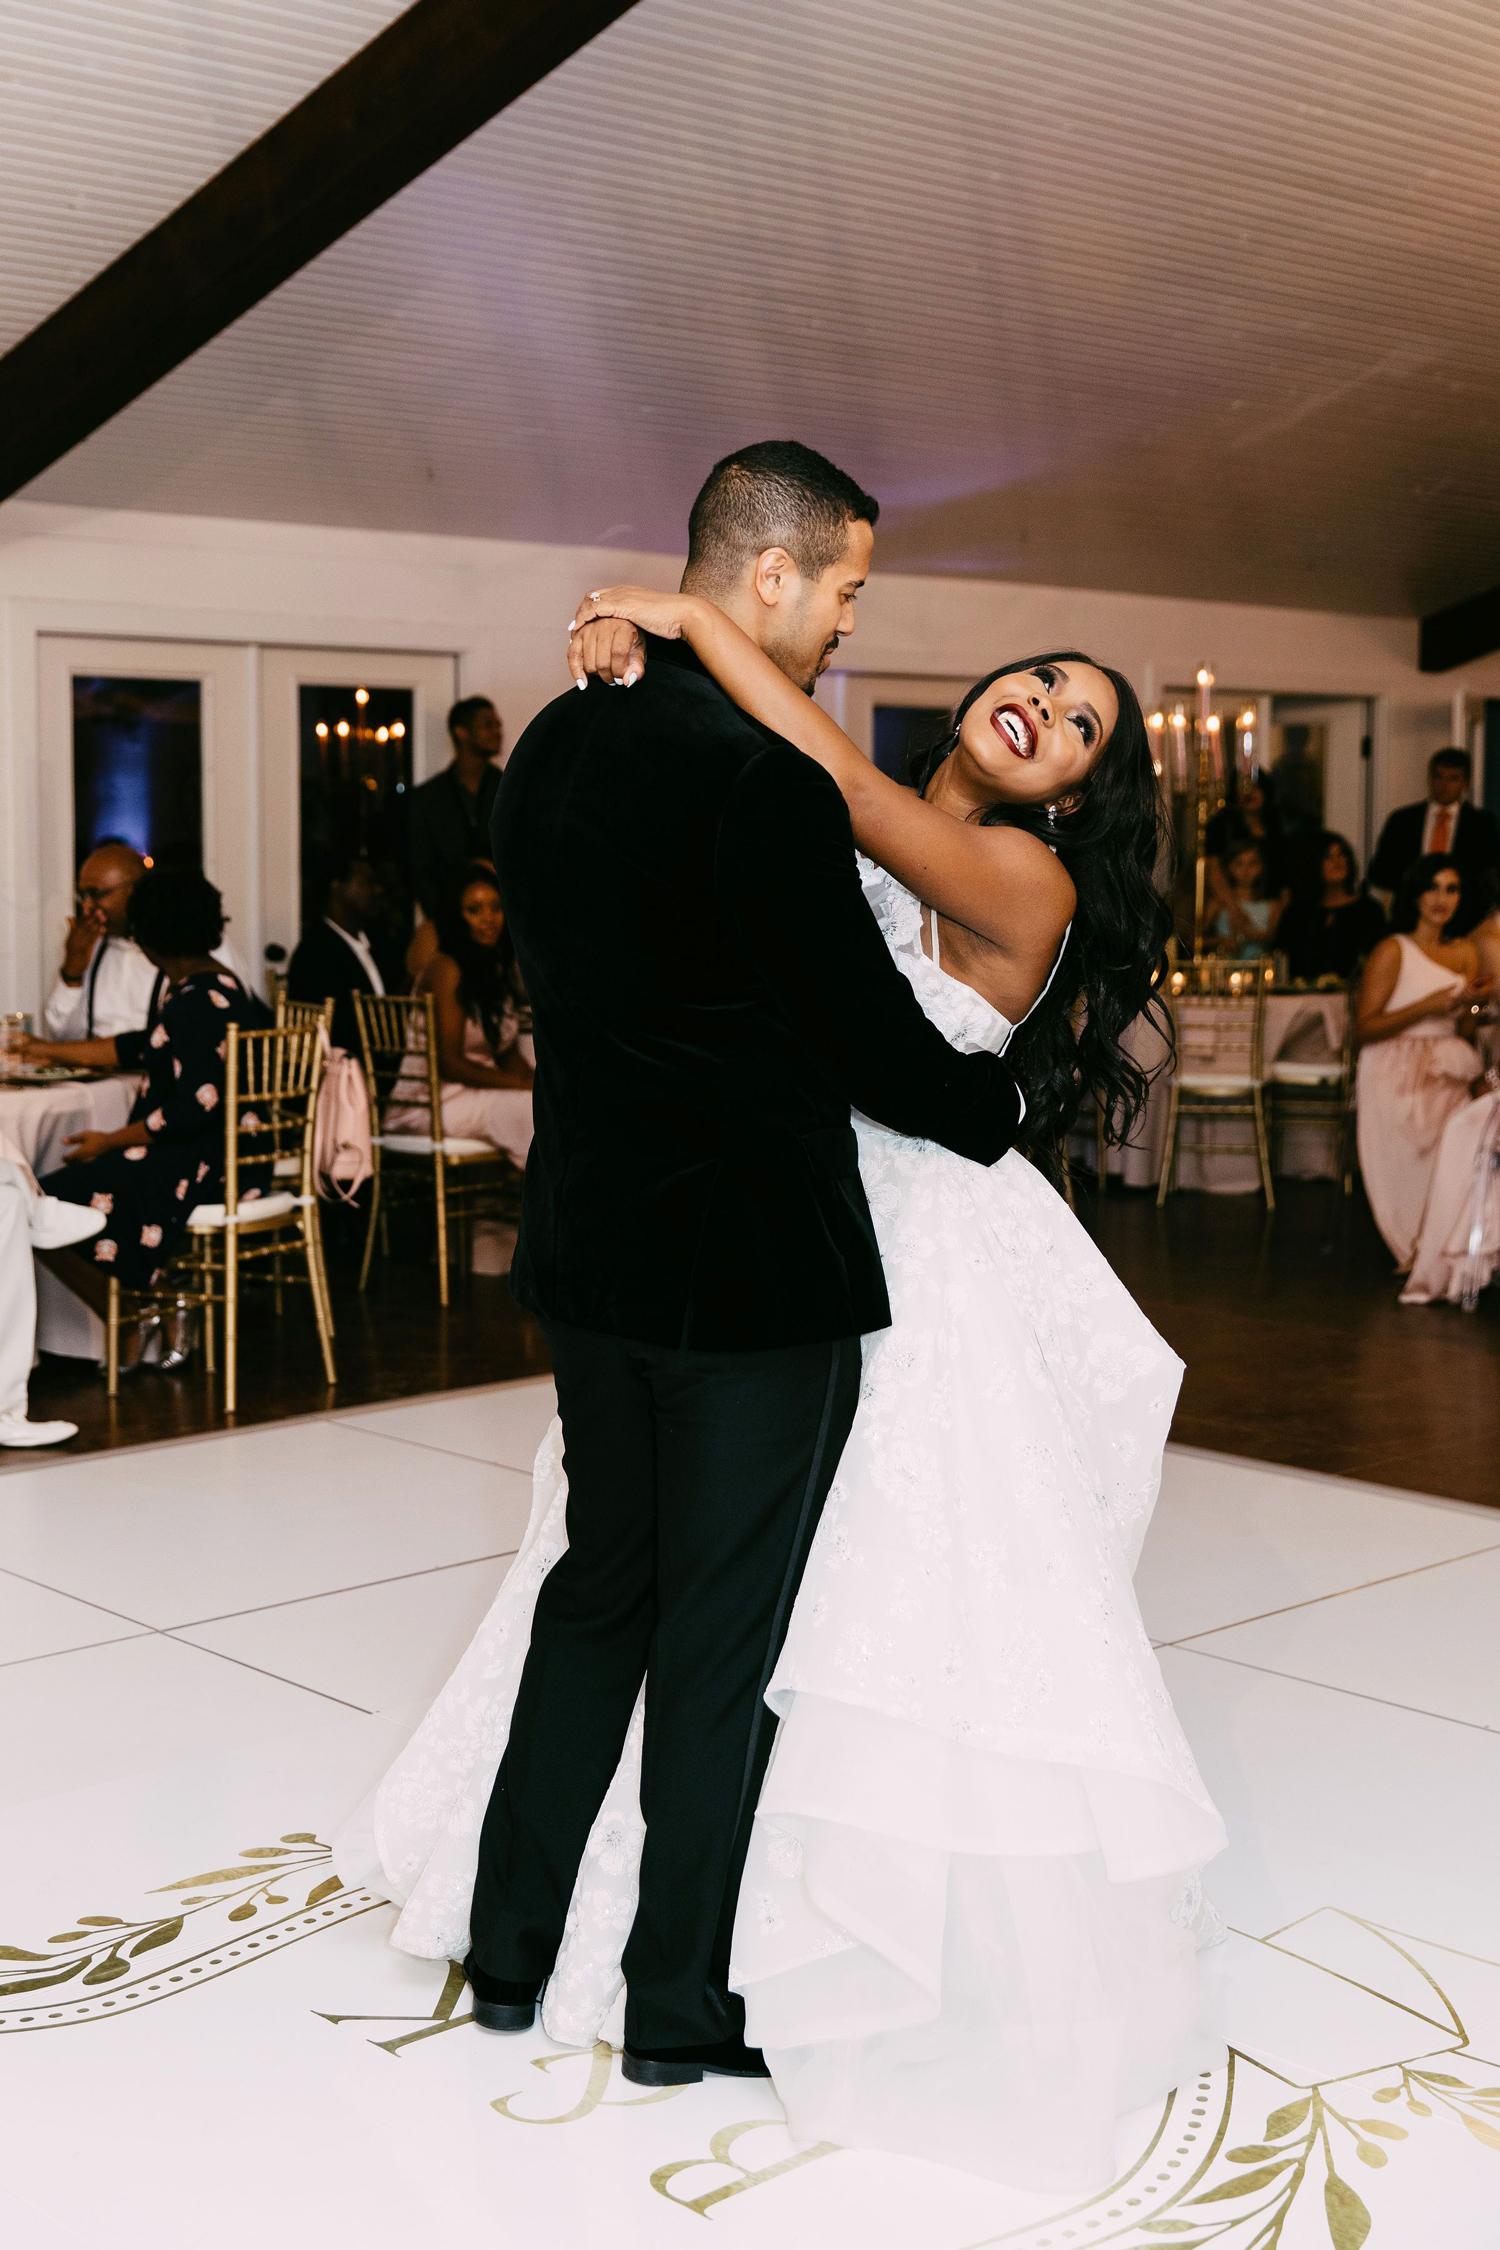 bride and groom sharing first dance on monogrammed dance floor